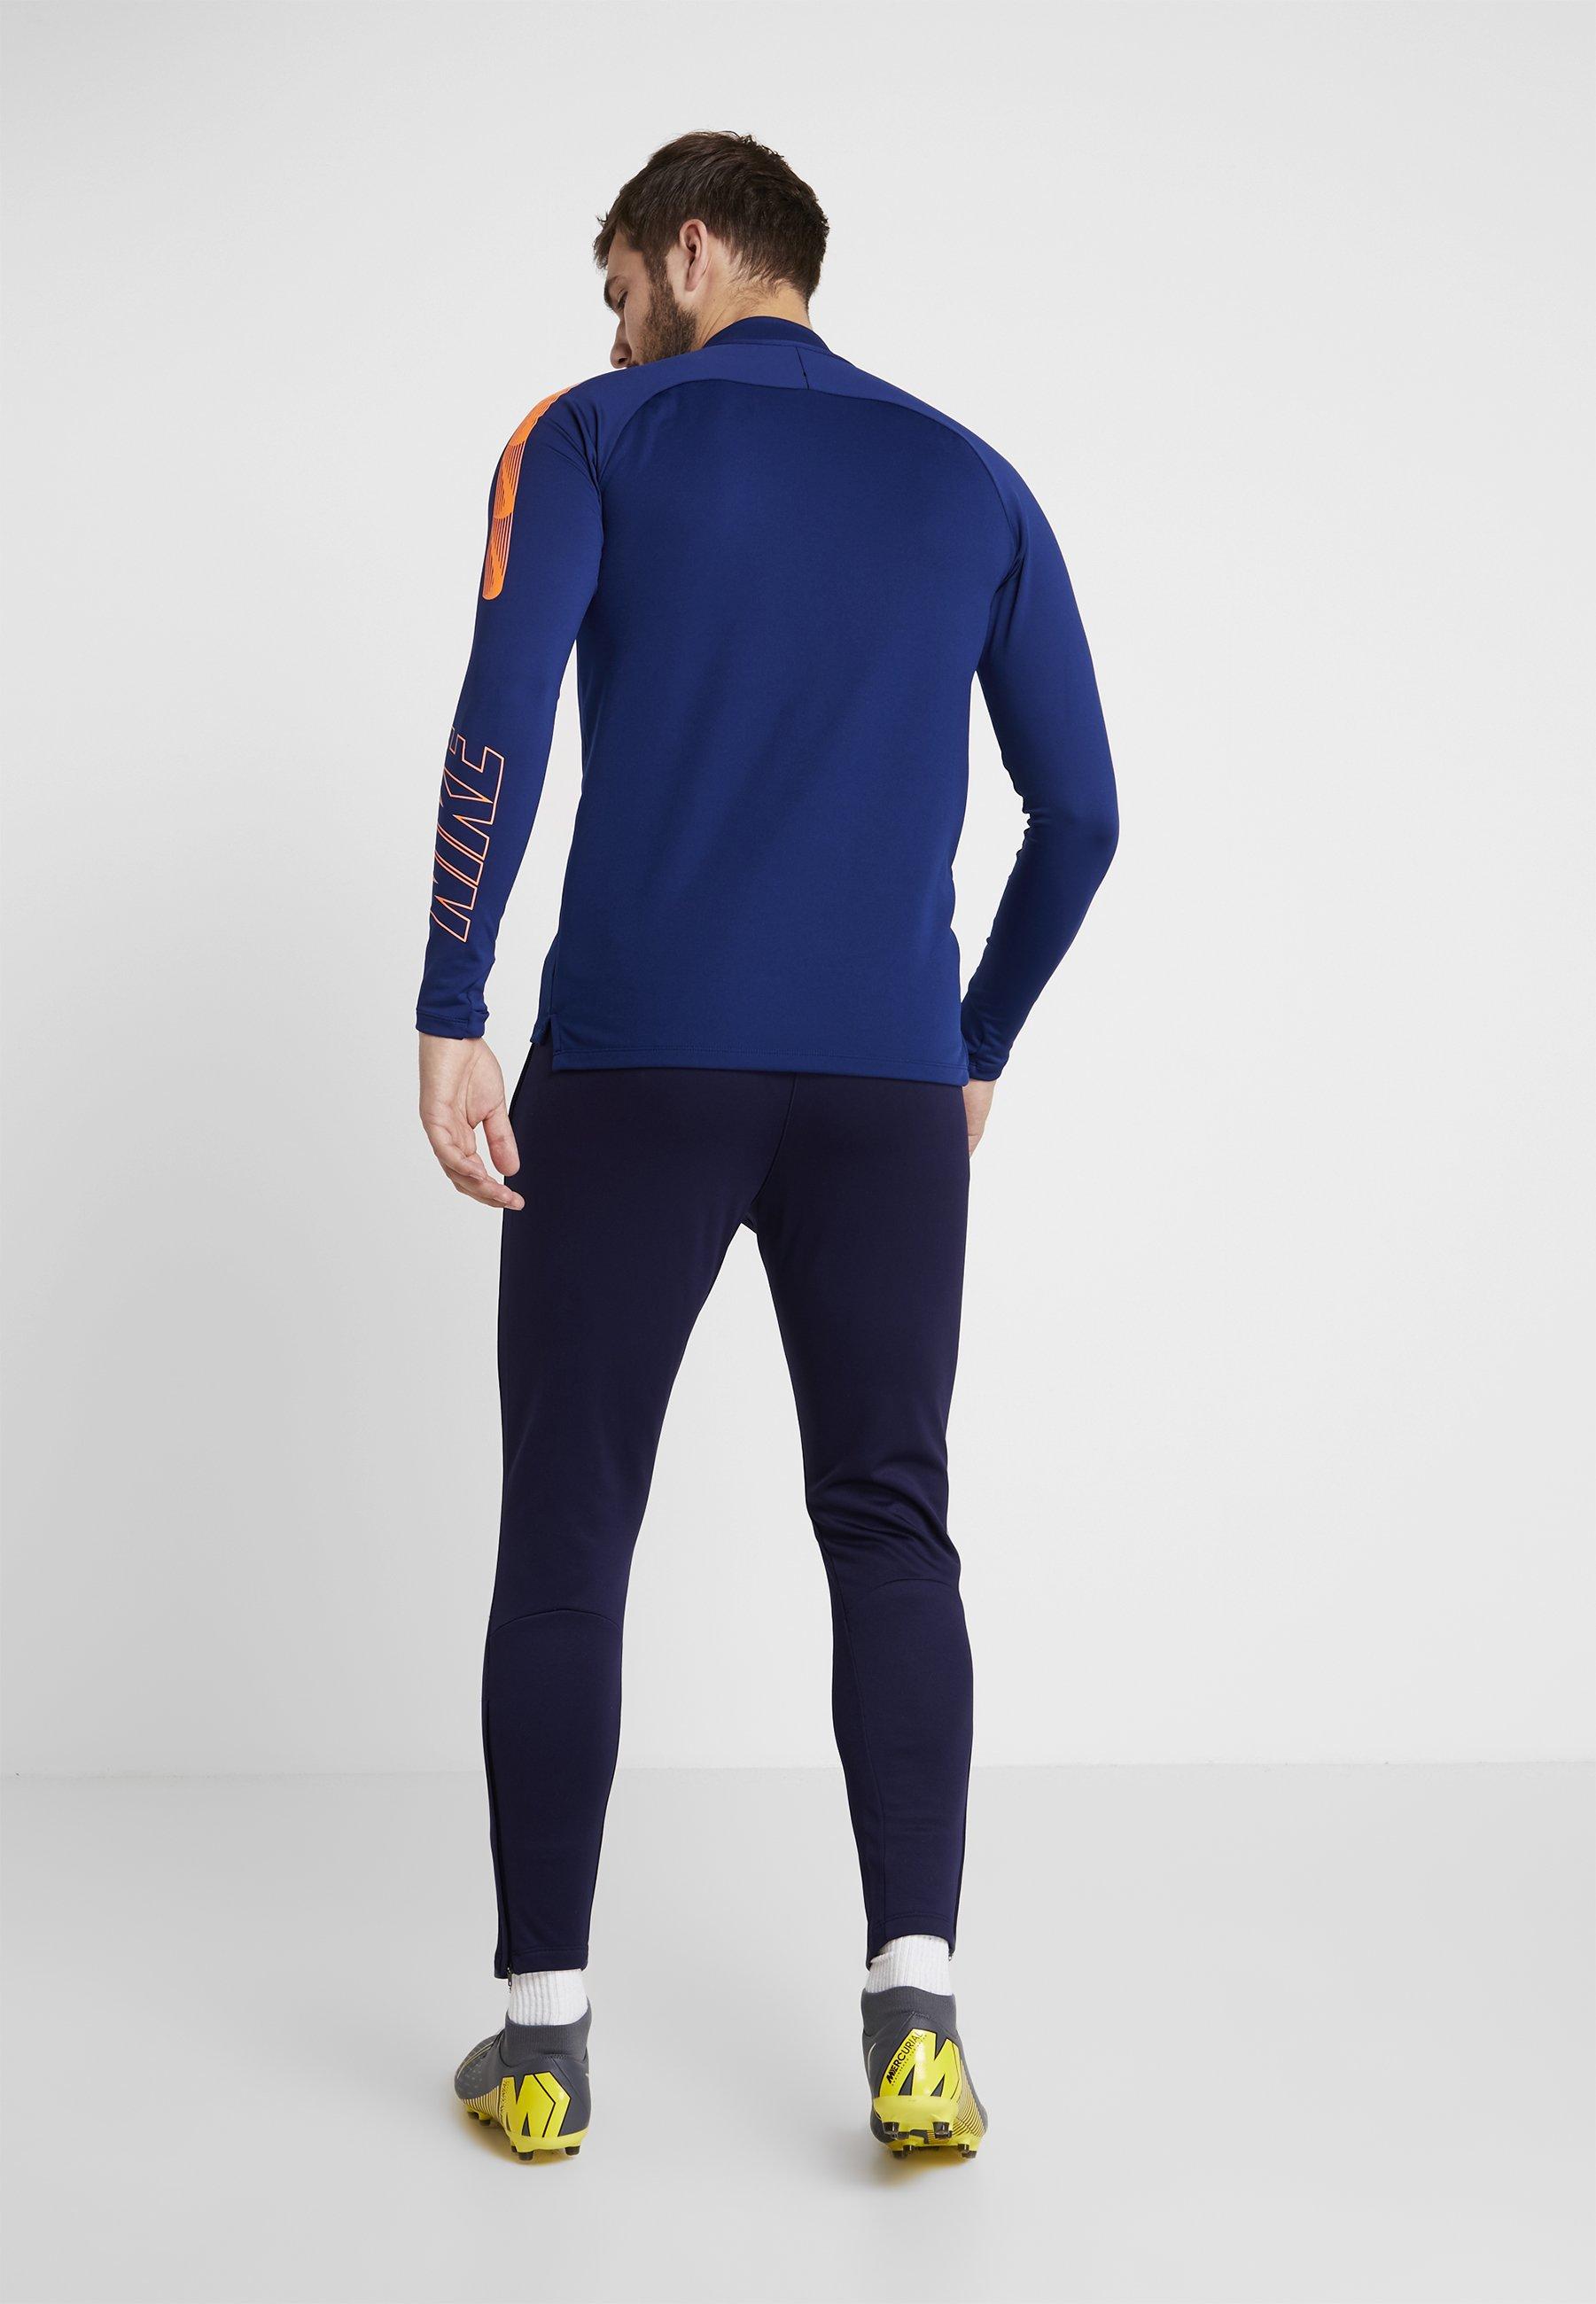 Tottenham Nike Performance Supporter Blue Hotspurs De Blackened PantArticle EQrCBeWxdo